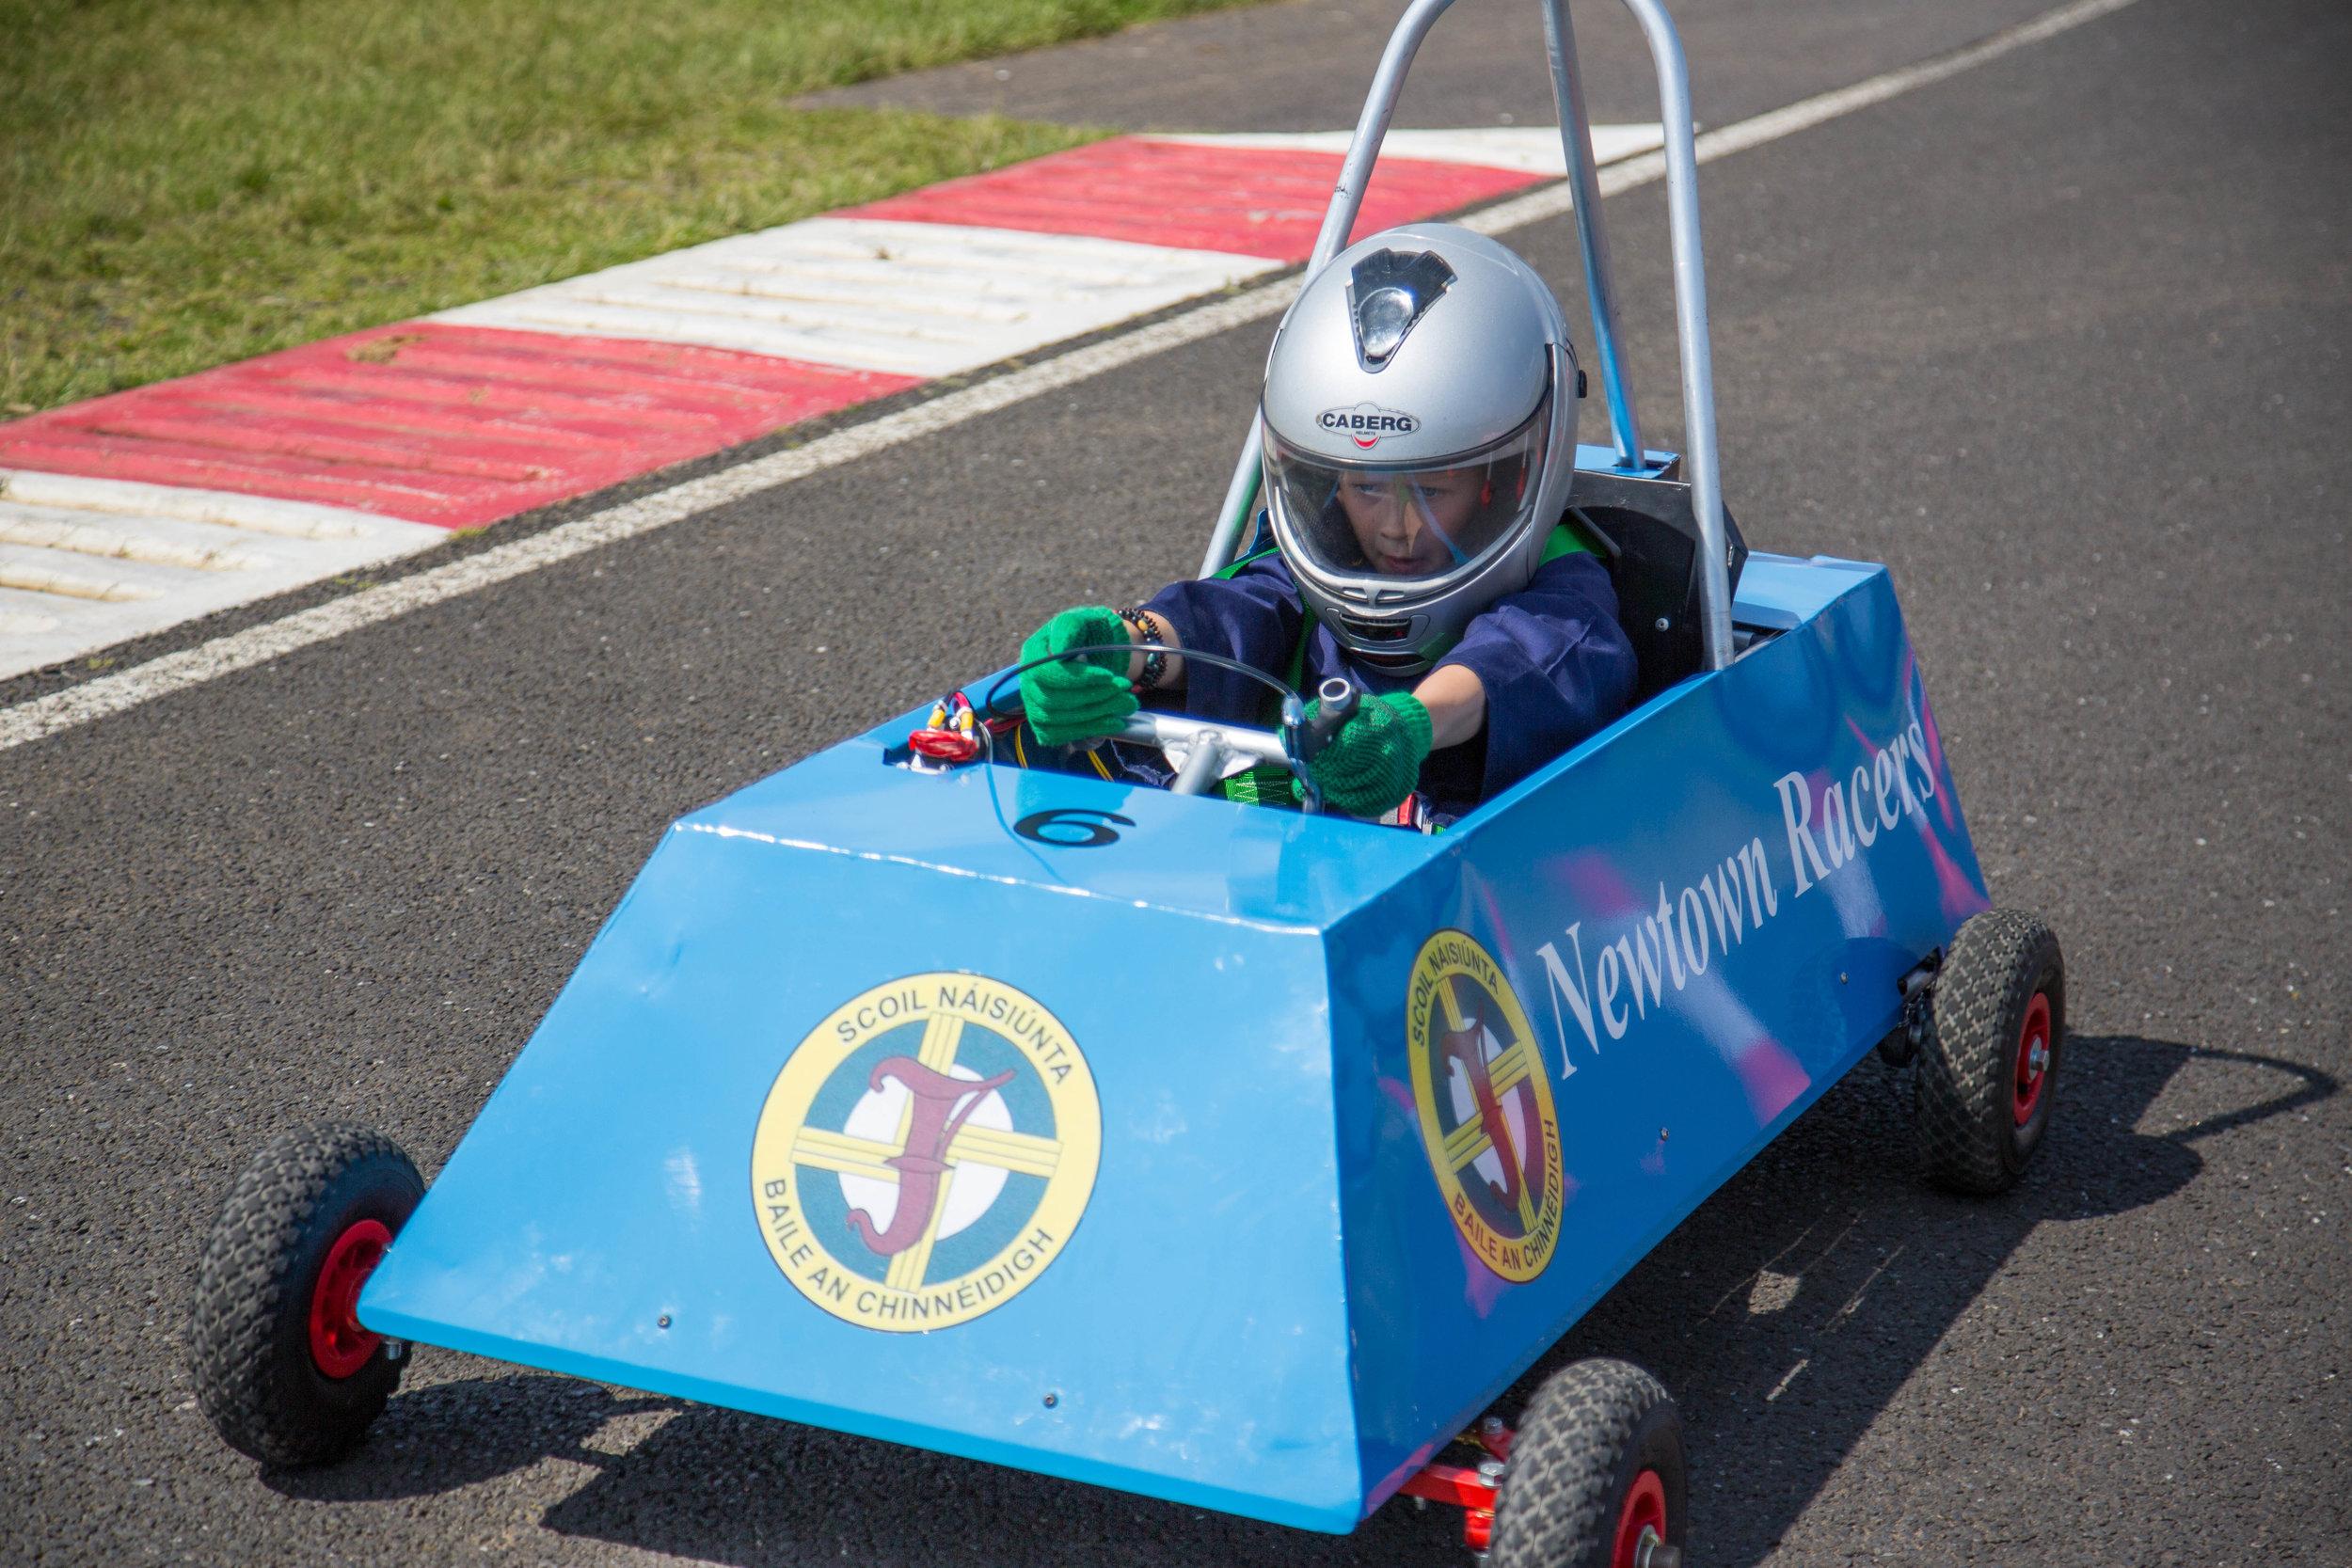 Newtownmountkennedy_Newtown_Racers.jpg